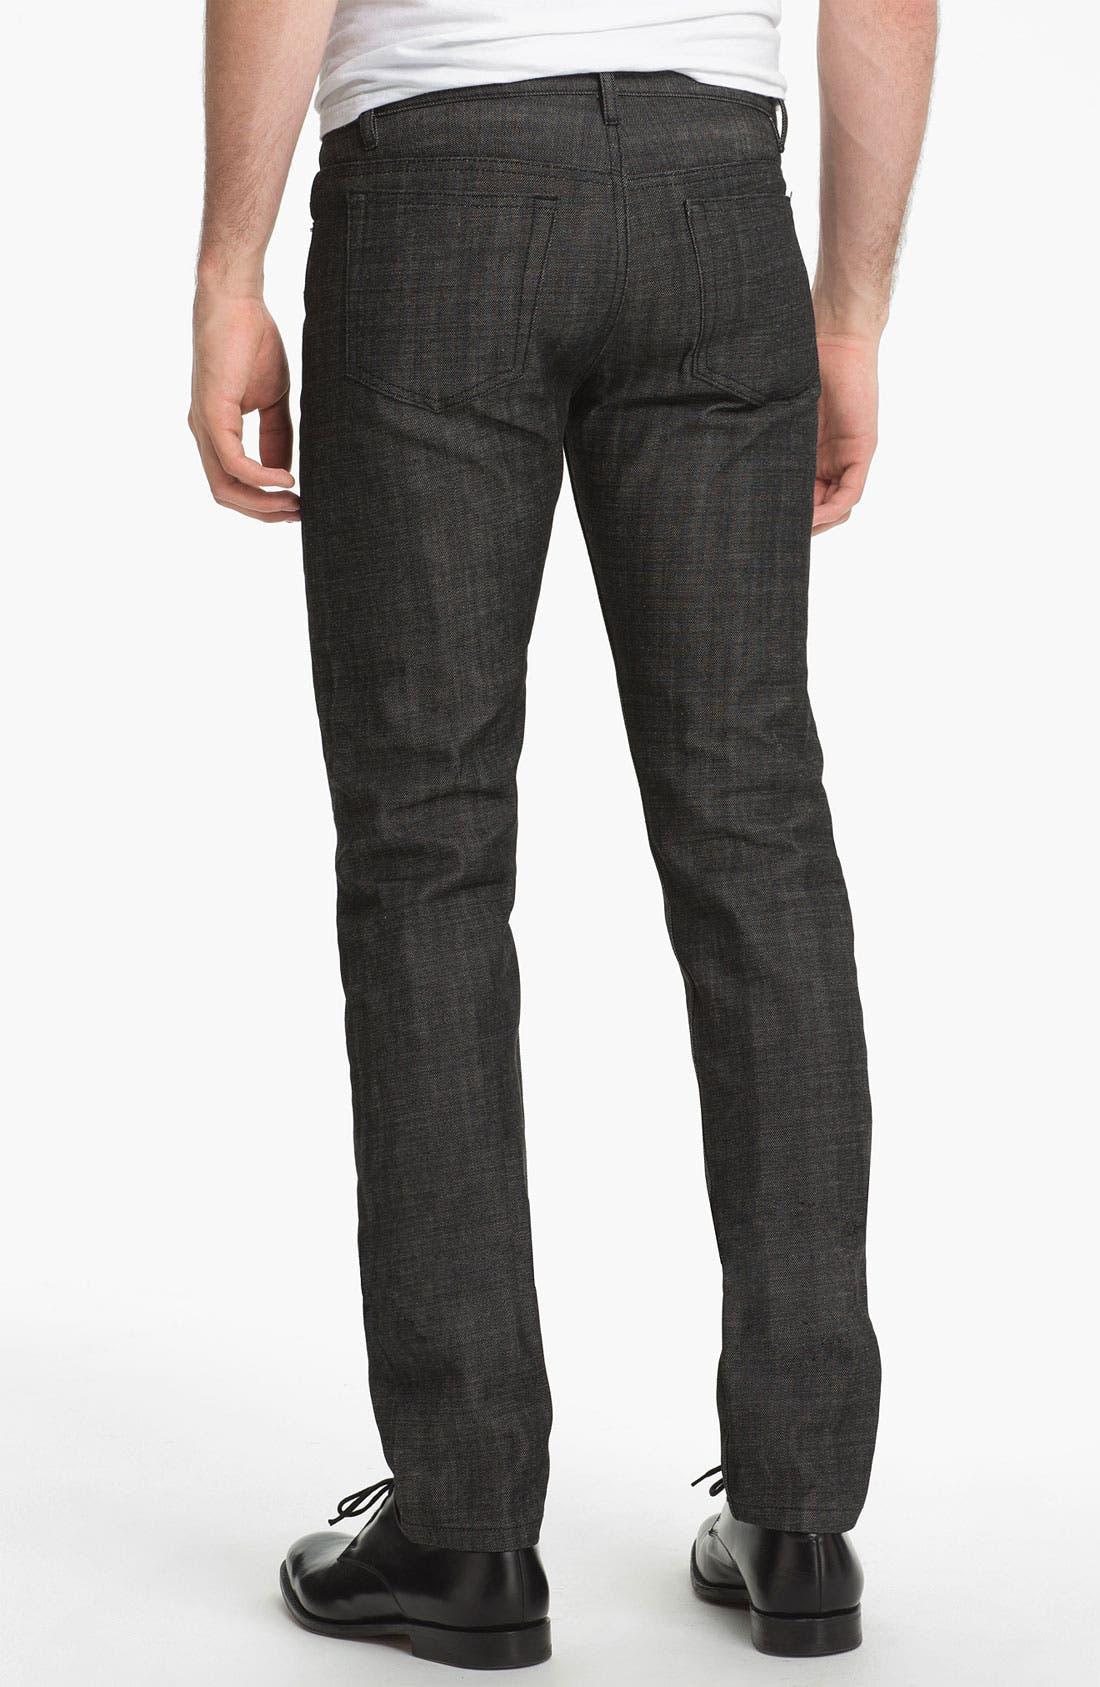 Alternate Image 2  - A.P.C. 'Petit Standard' Slim Leg Jeans (Black) (Online Only)